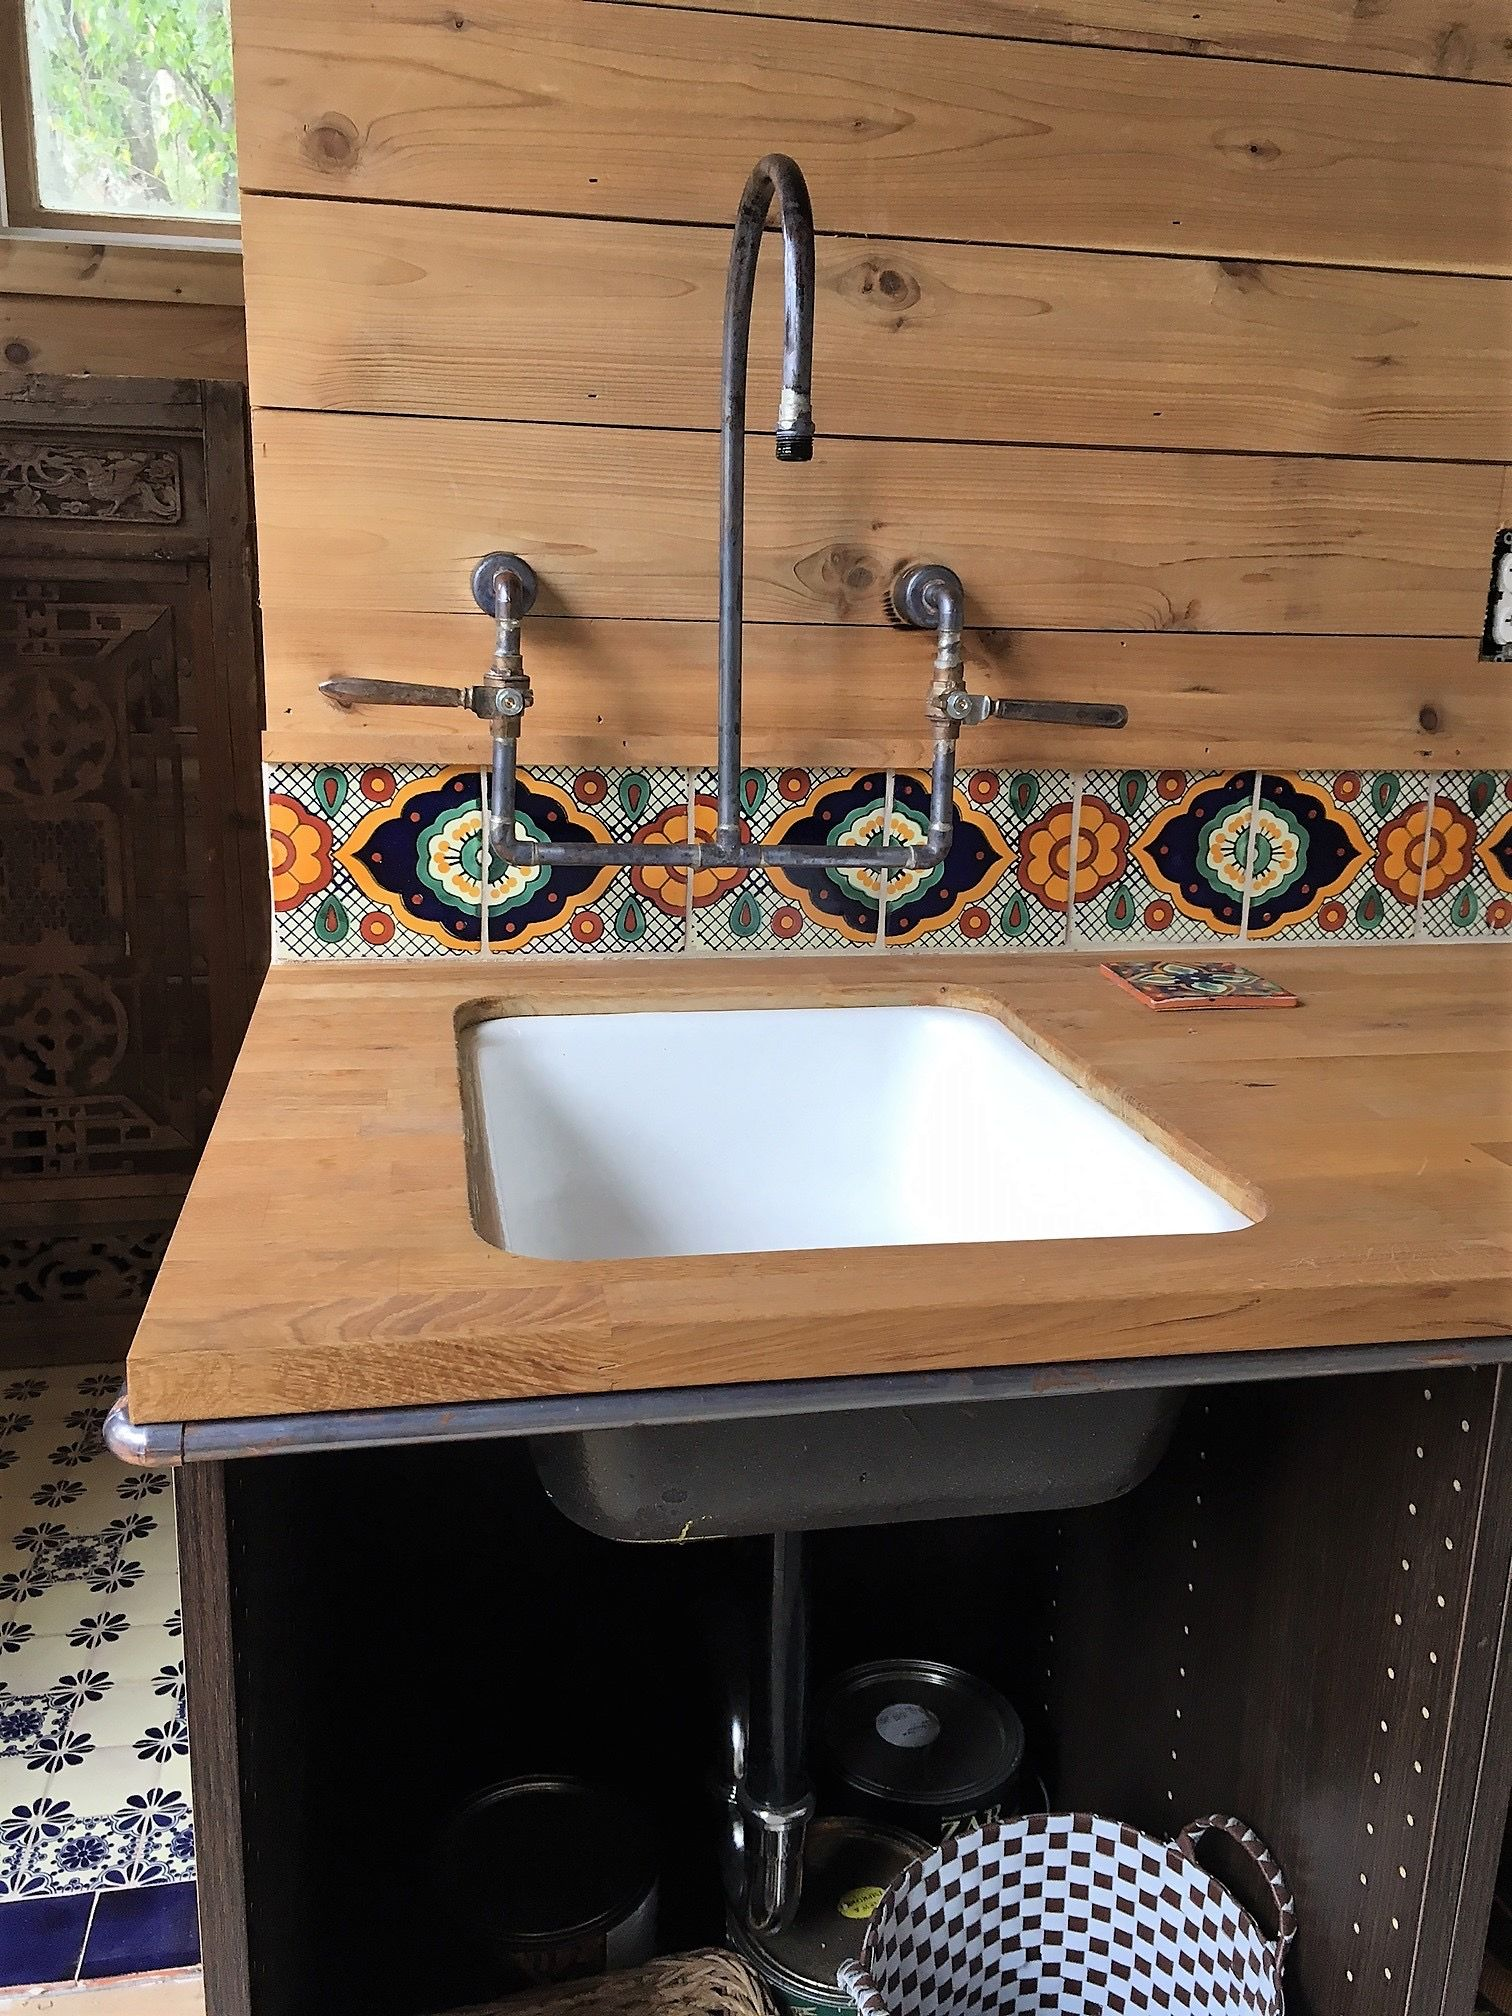 Homemade Faucet Bathroom Sink Remodel Traditional Bathroom Faucets Bathroom Faucets [ 2016 x 1512 Pixel ]